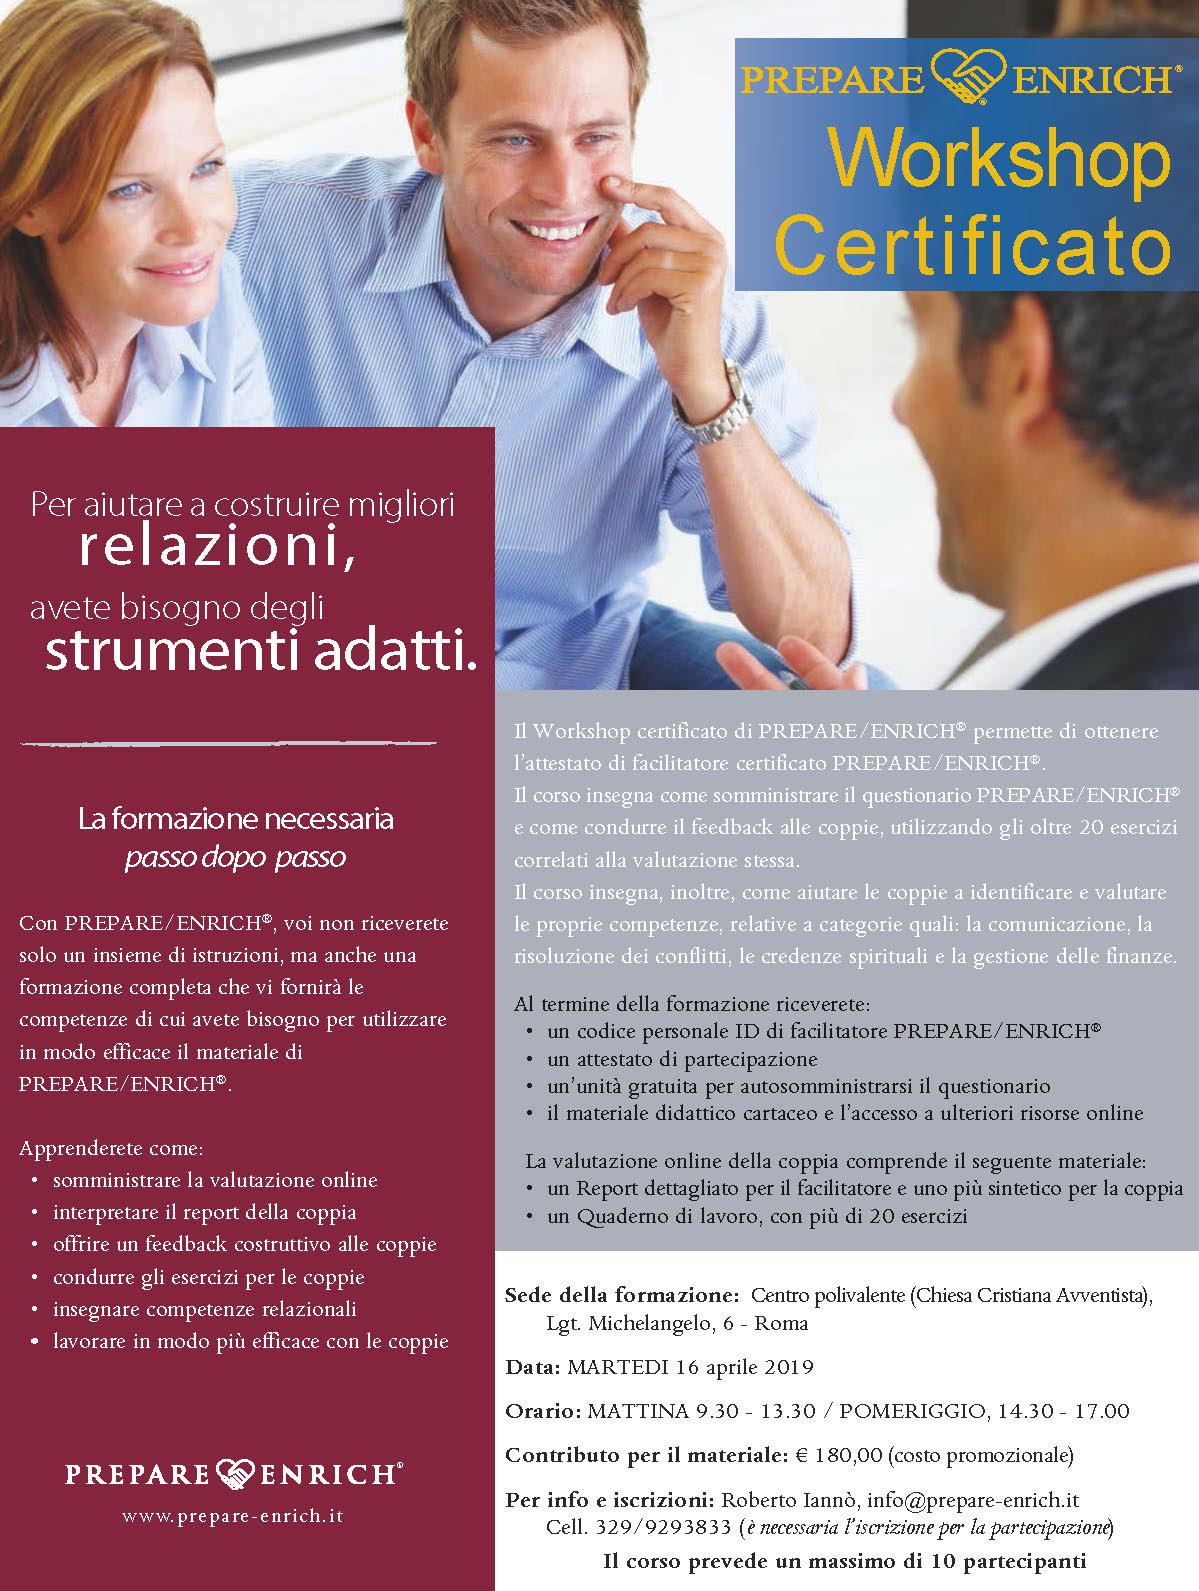 Workshop Certificato, aprile 2019